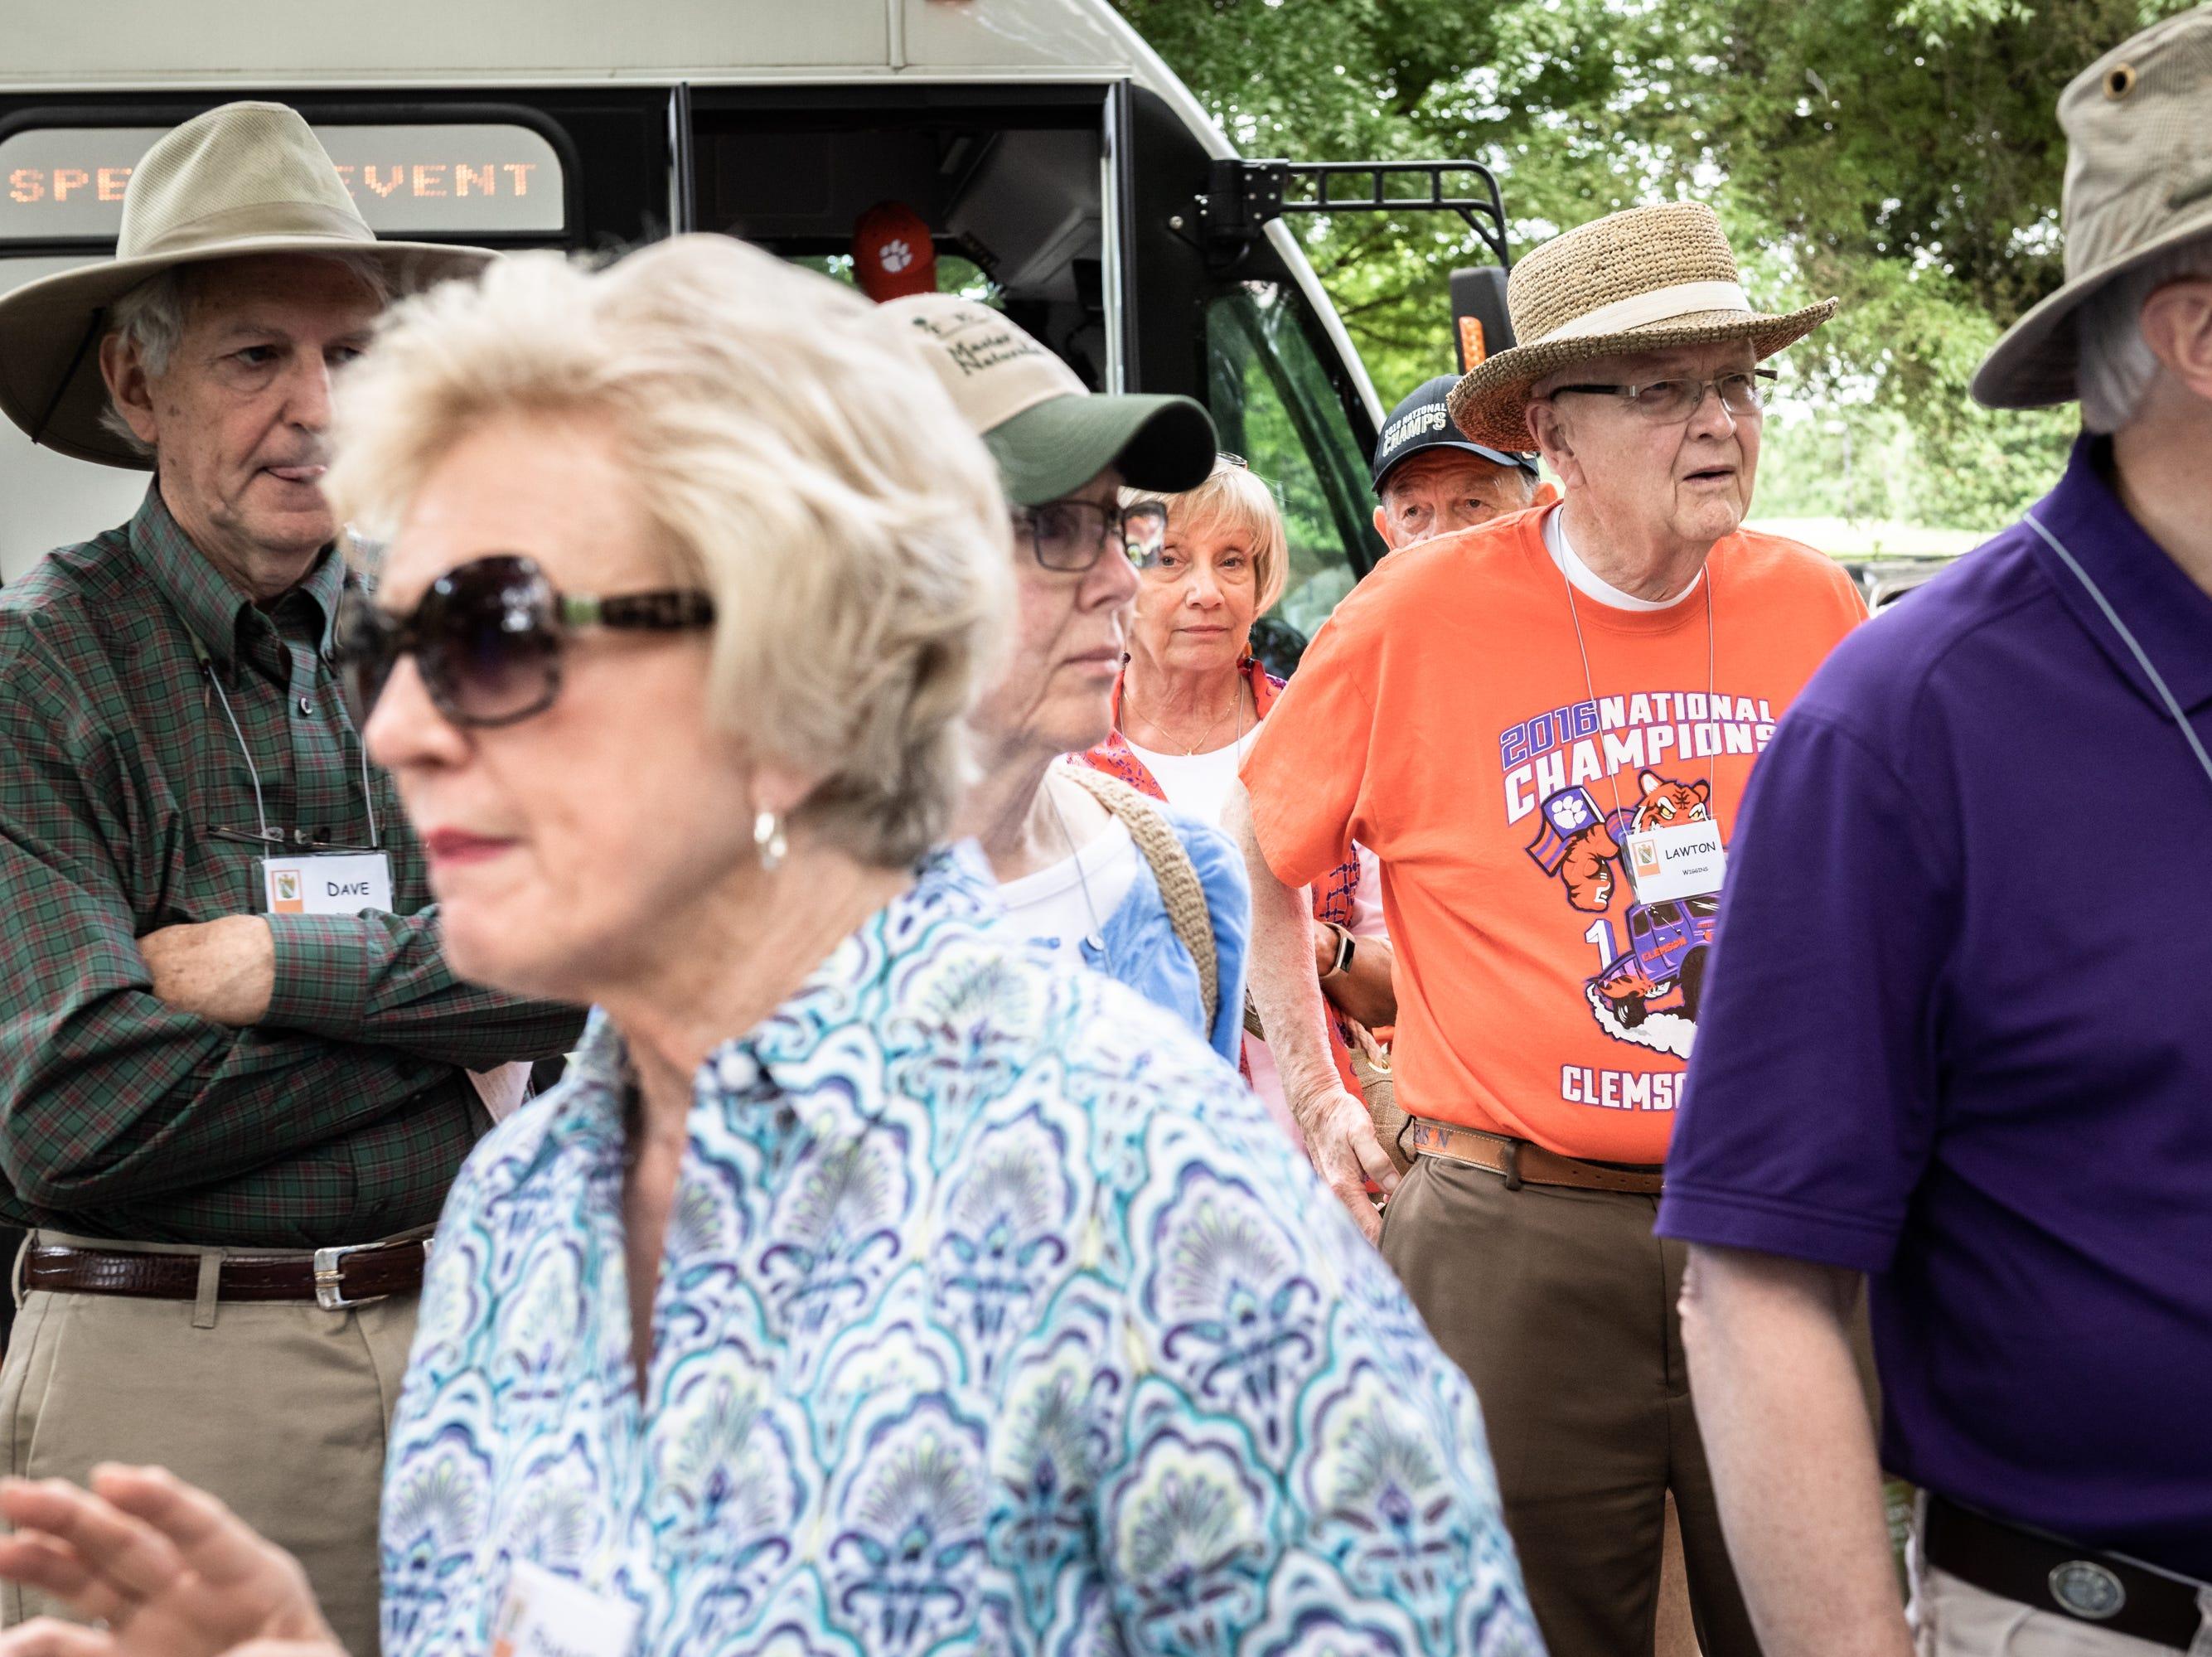 Members of the Clemson University fraternity Kappa Delta Chi, toured Clemson's South Carolina Botanical Garden Monday, May, 6, 2019, during their biennial reunion.